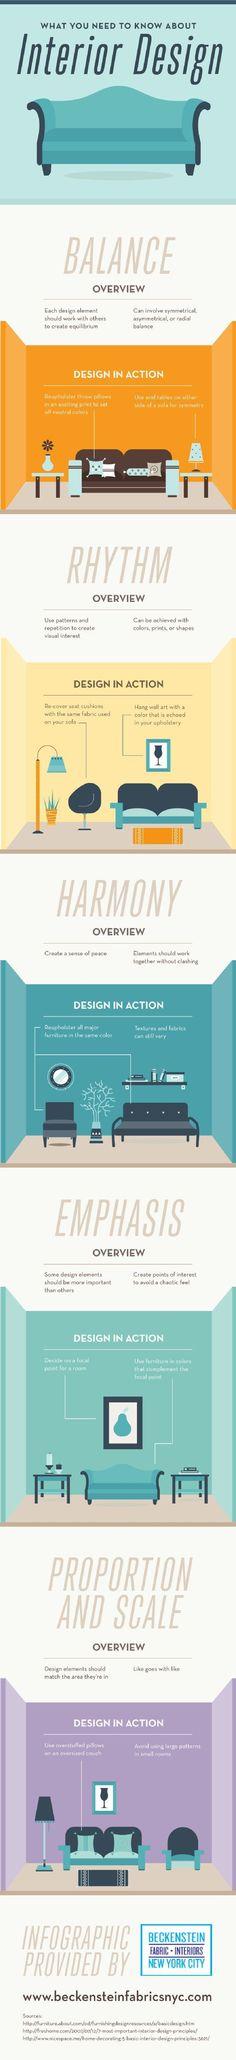 Handy Interior Design Tips That Will Enhances Your Home - Helpful Home Decor Tips Home Design, Interior Design Tips, Interior Design Inspiration, Web Design, Design Styles, Interior Design Vocabulary, Design Concepts, Interior Ideas, Design Elements